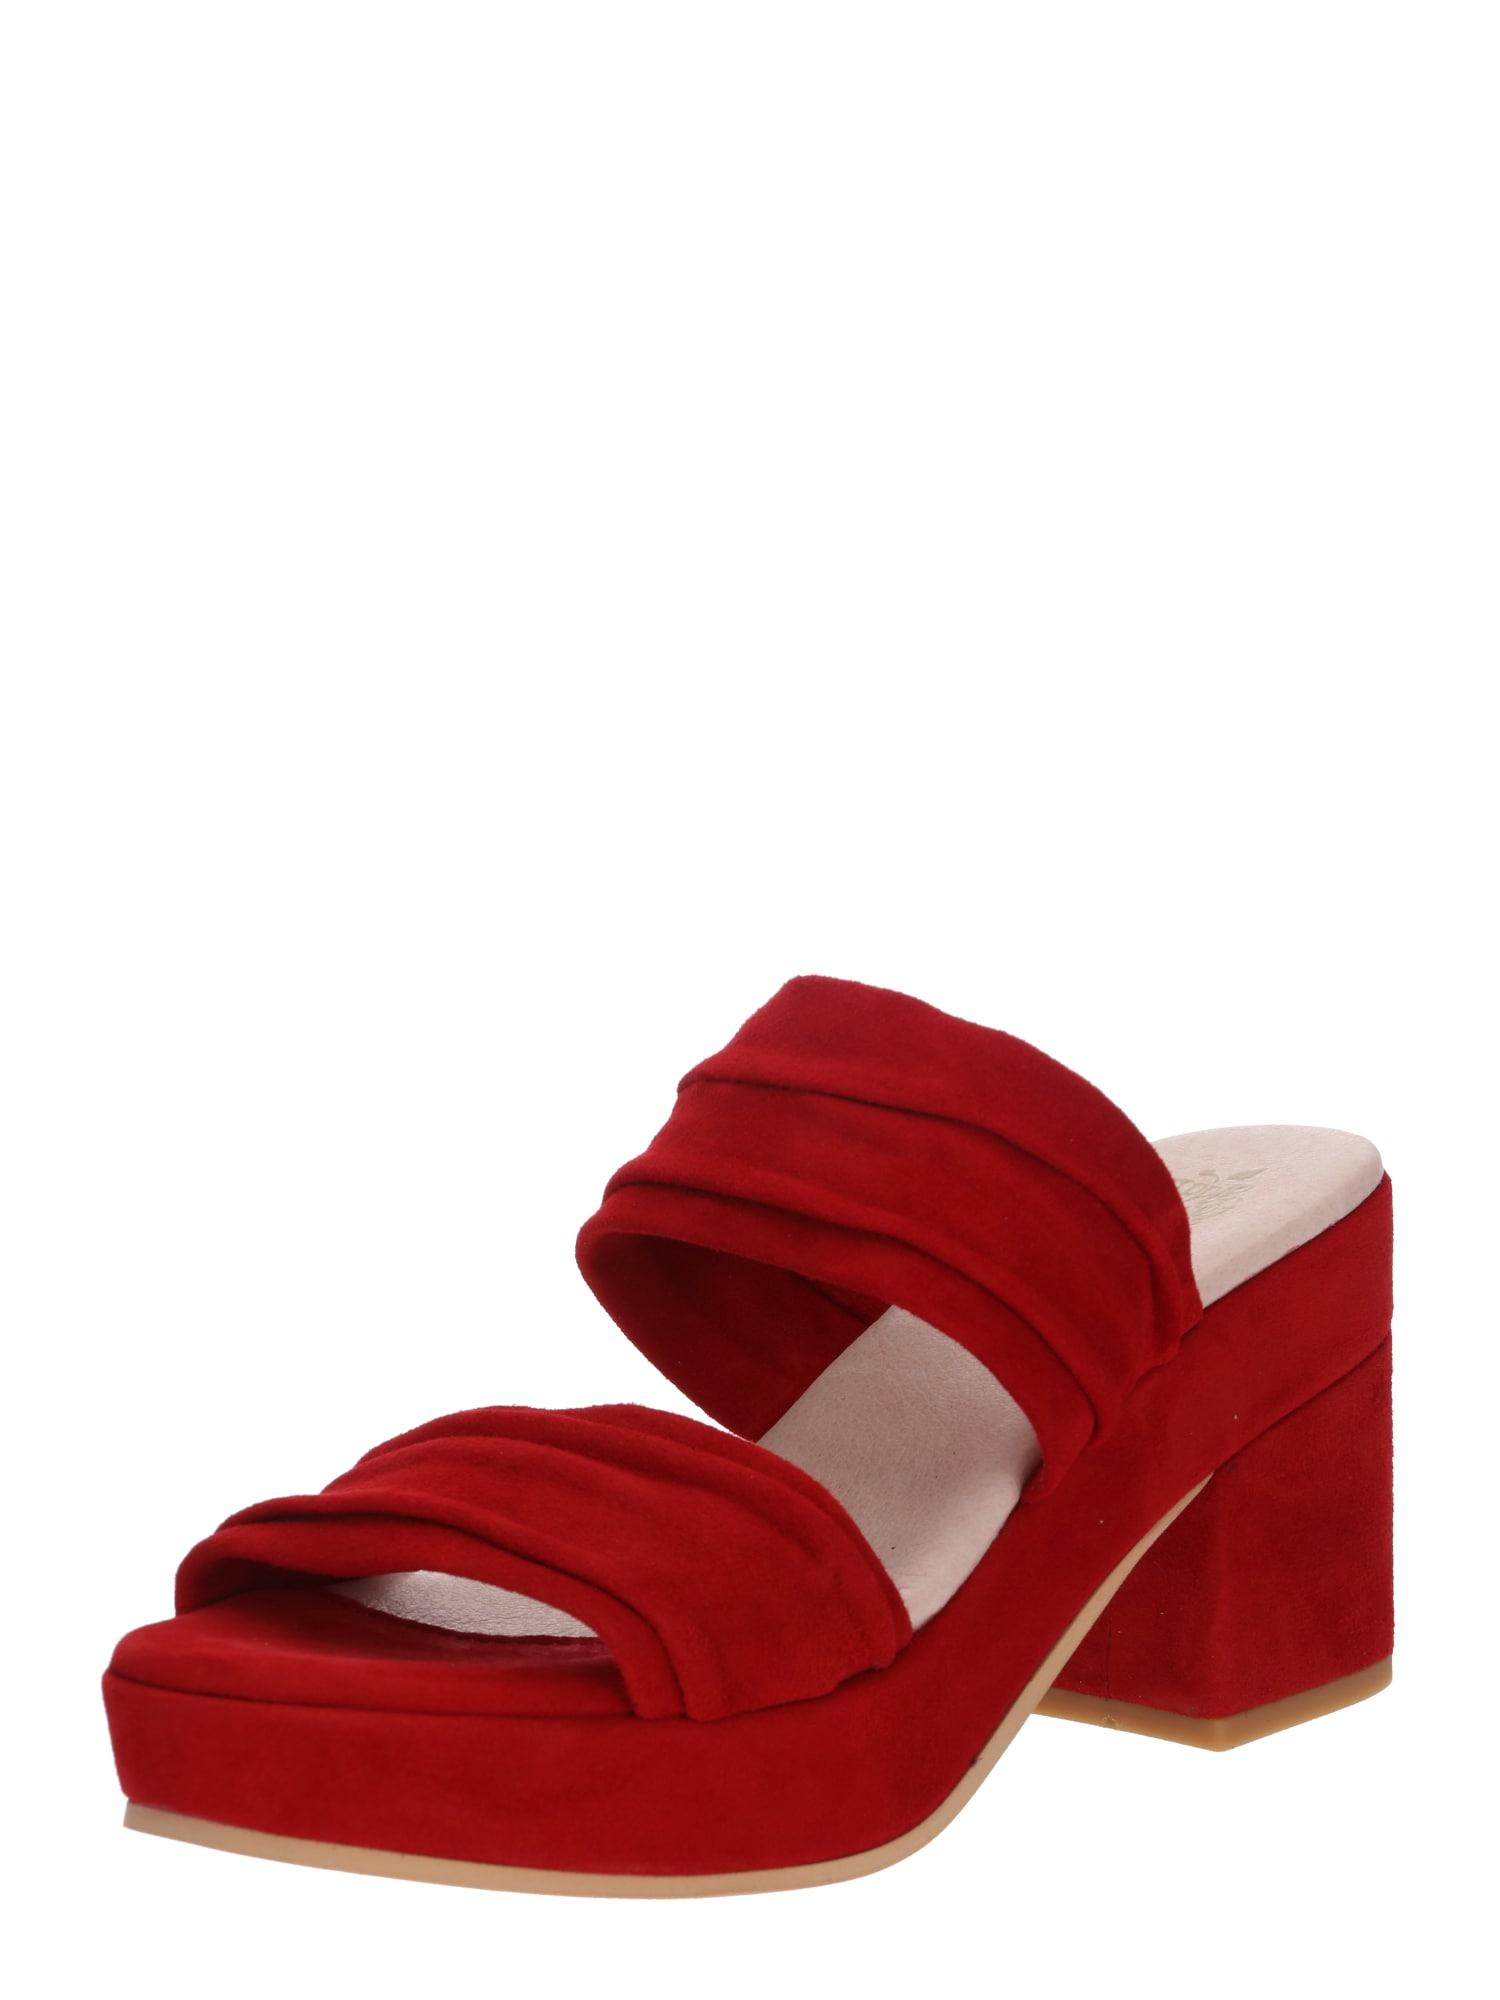 Sandály Blanca červená Apple Of Eden